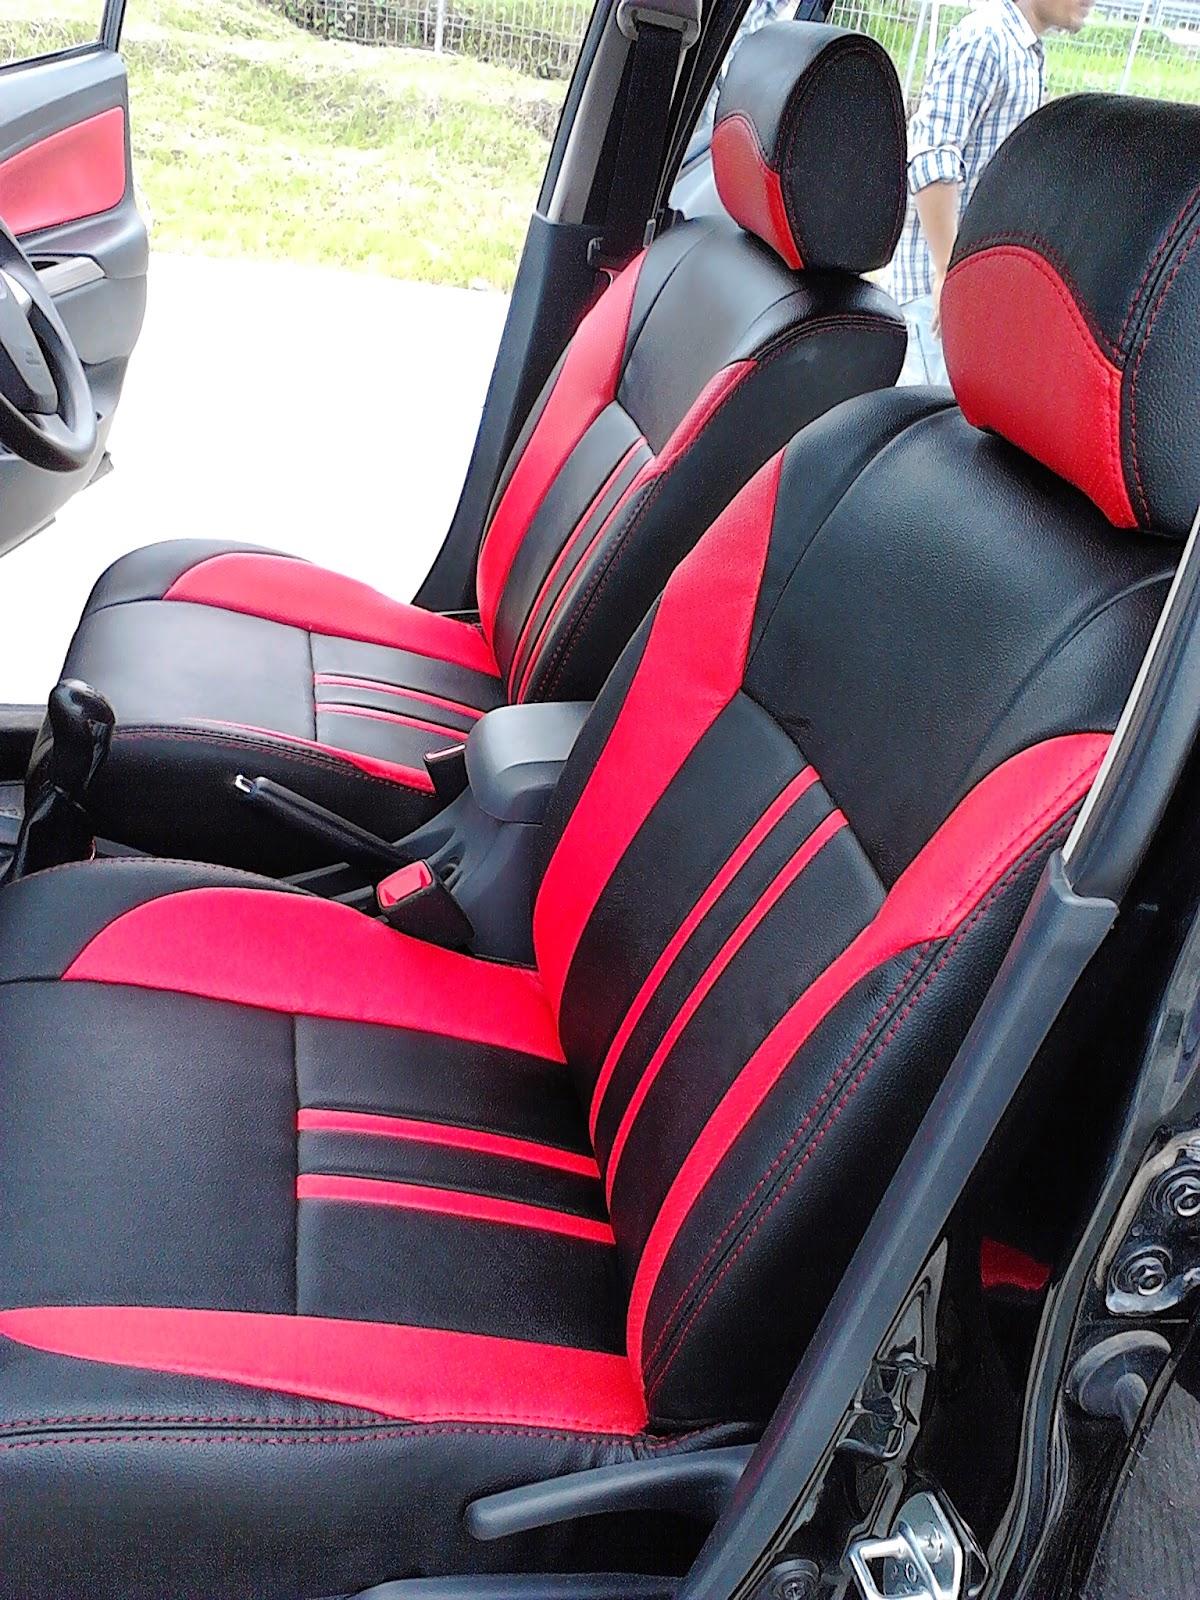 jok grand new avanza harga all kijang innova 2.4 v a/t diesel lux 97 modifikasi hitam elegant 2017 mobil